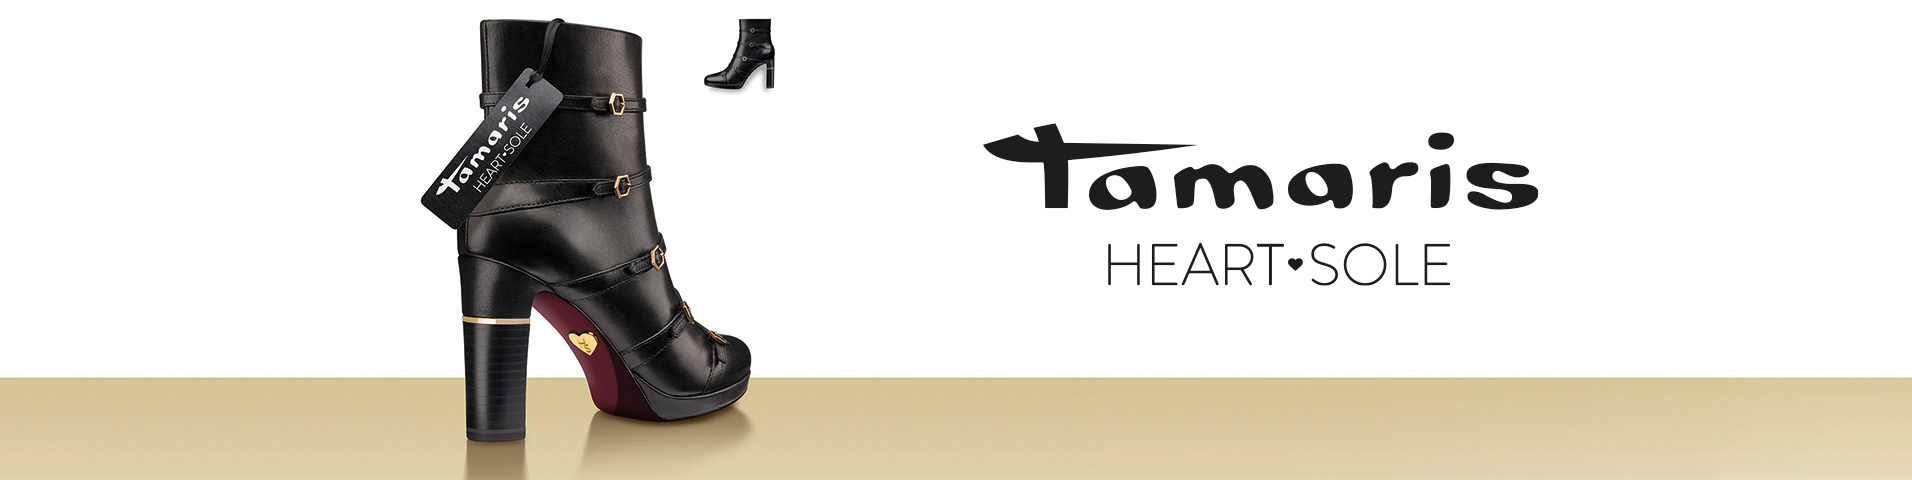 Sole Heartamp; Shop Sole Online Shop Heartamp; Tamaris Tamaris Online Heartamp; Tamaris 2E9DHIW